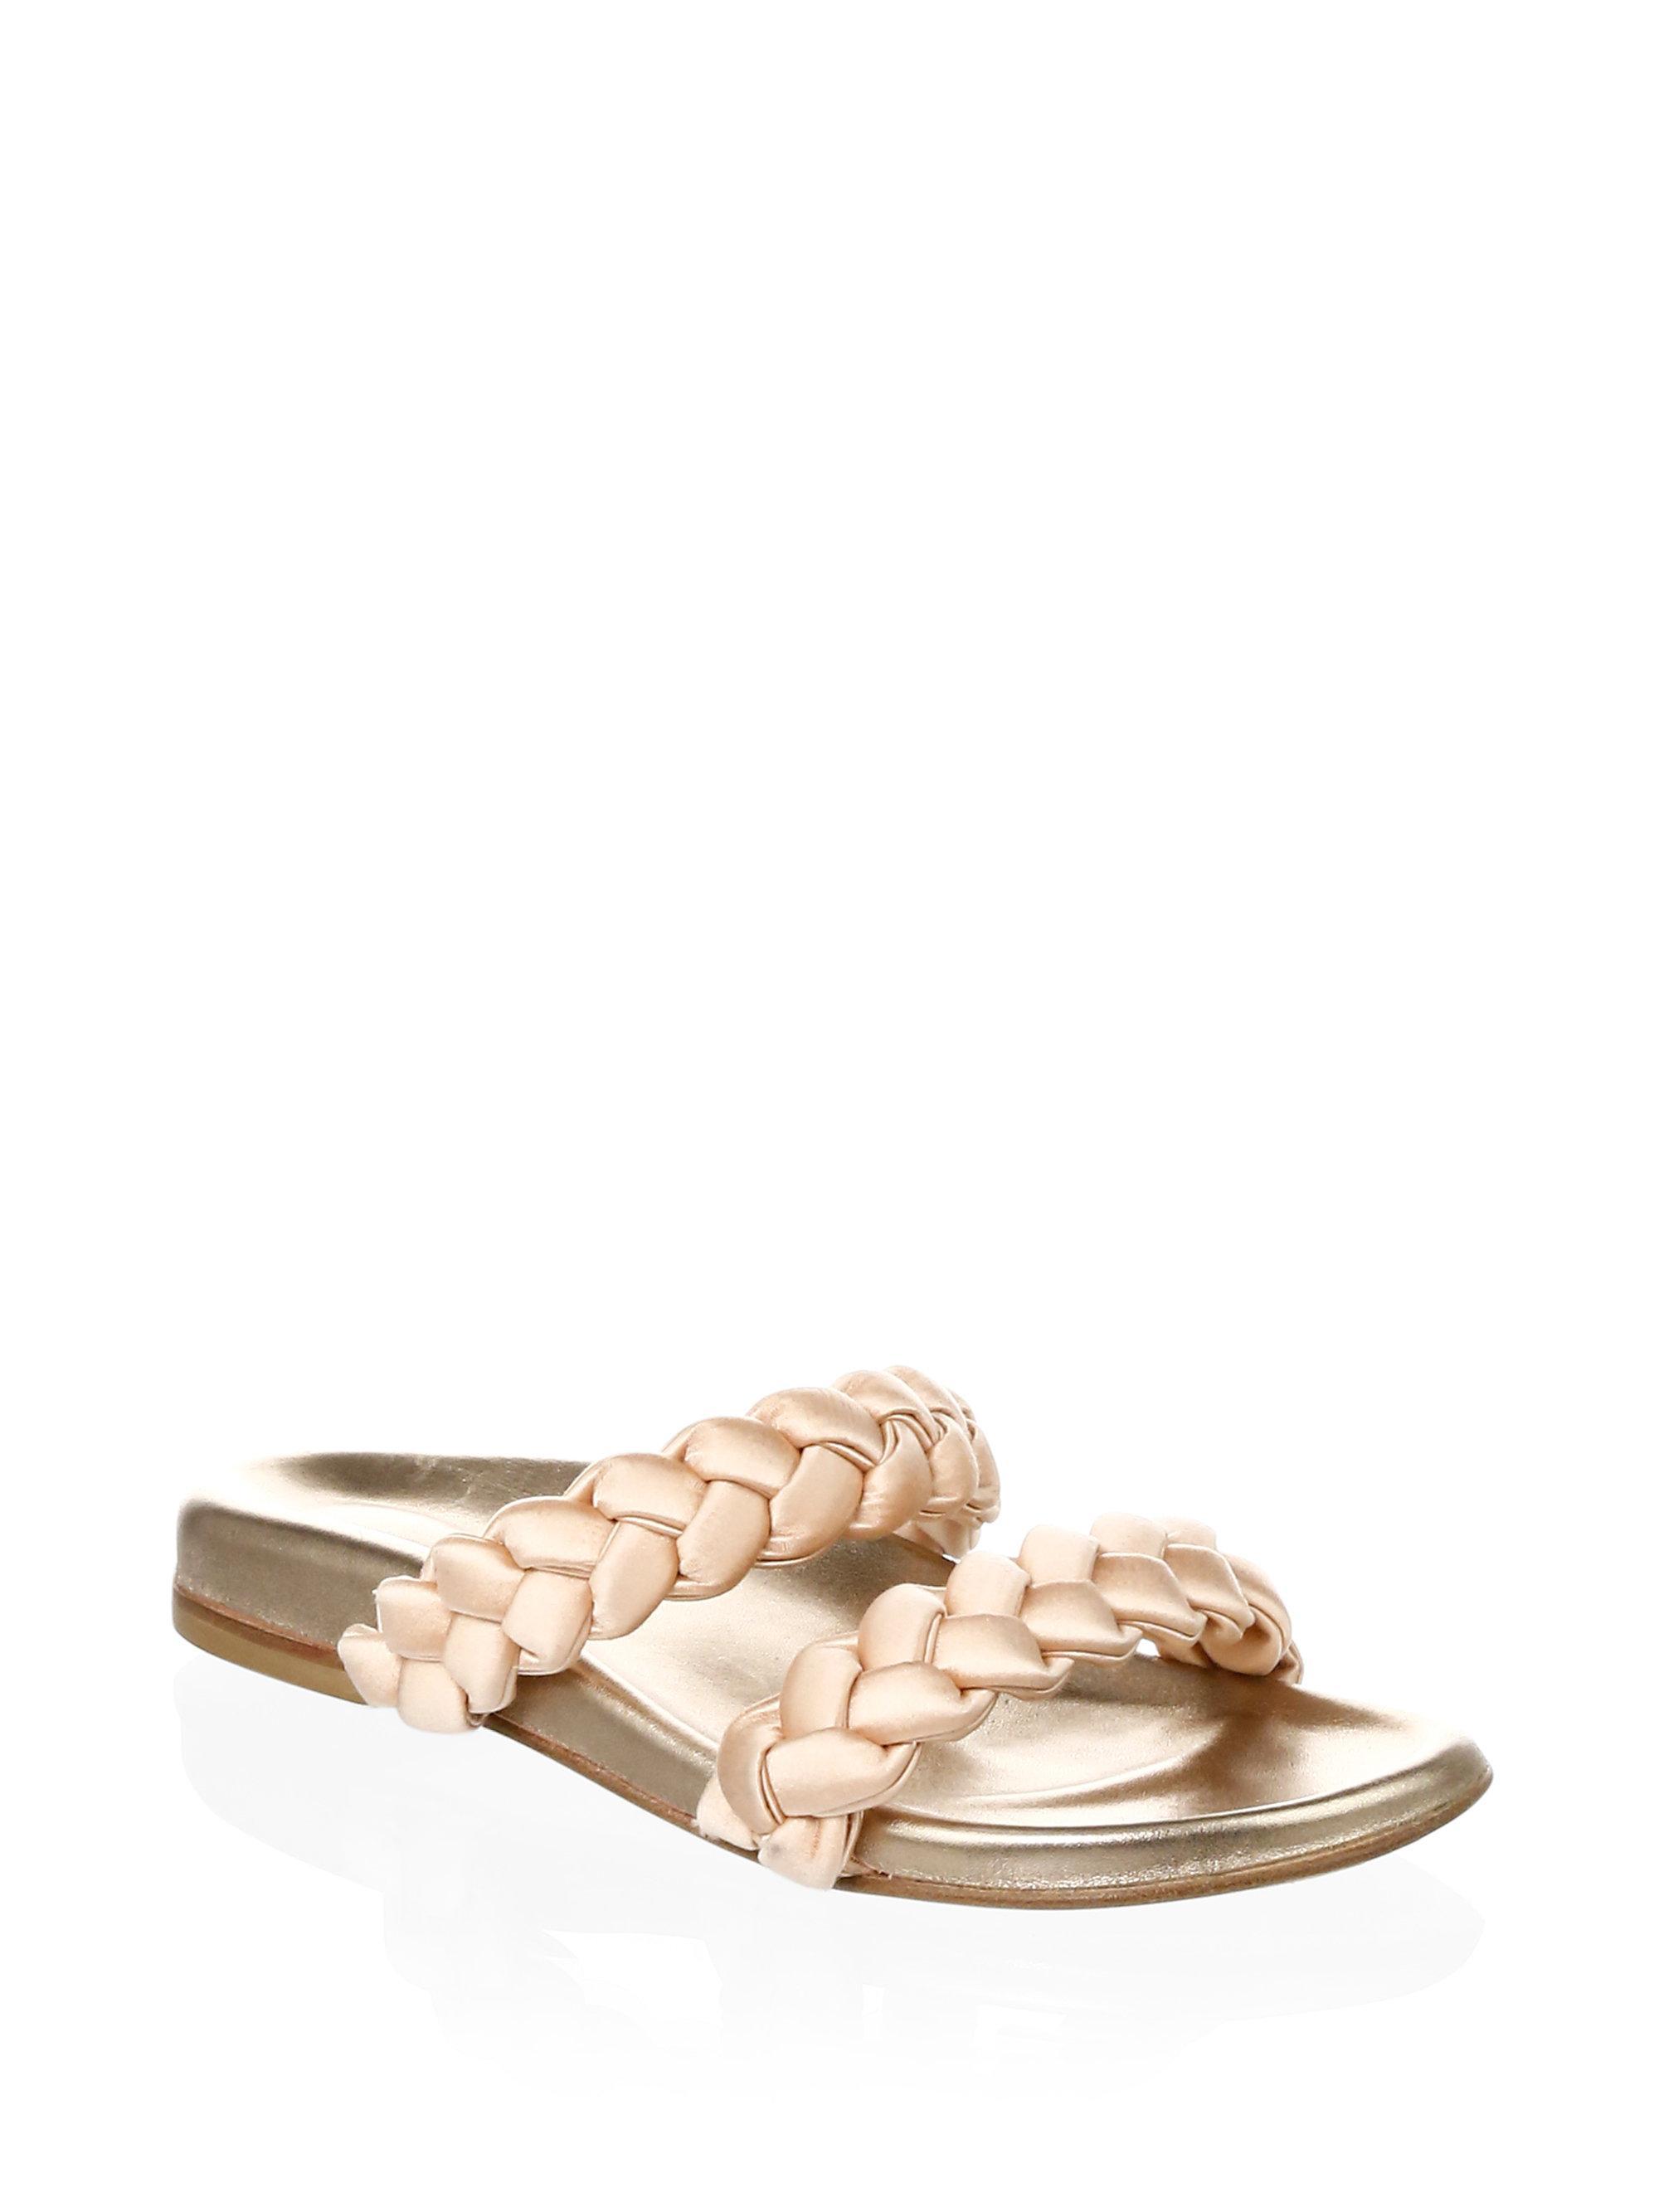 Oscar de la Renta Women's Charlee Satin Braid Slide Sandals e3m3HlgXK